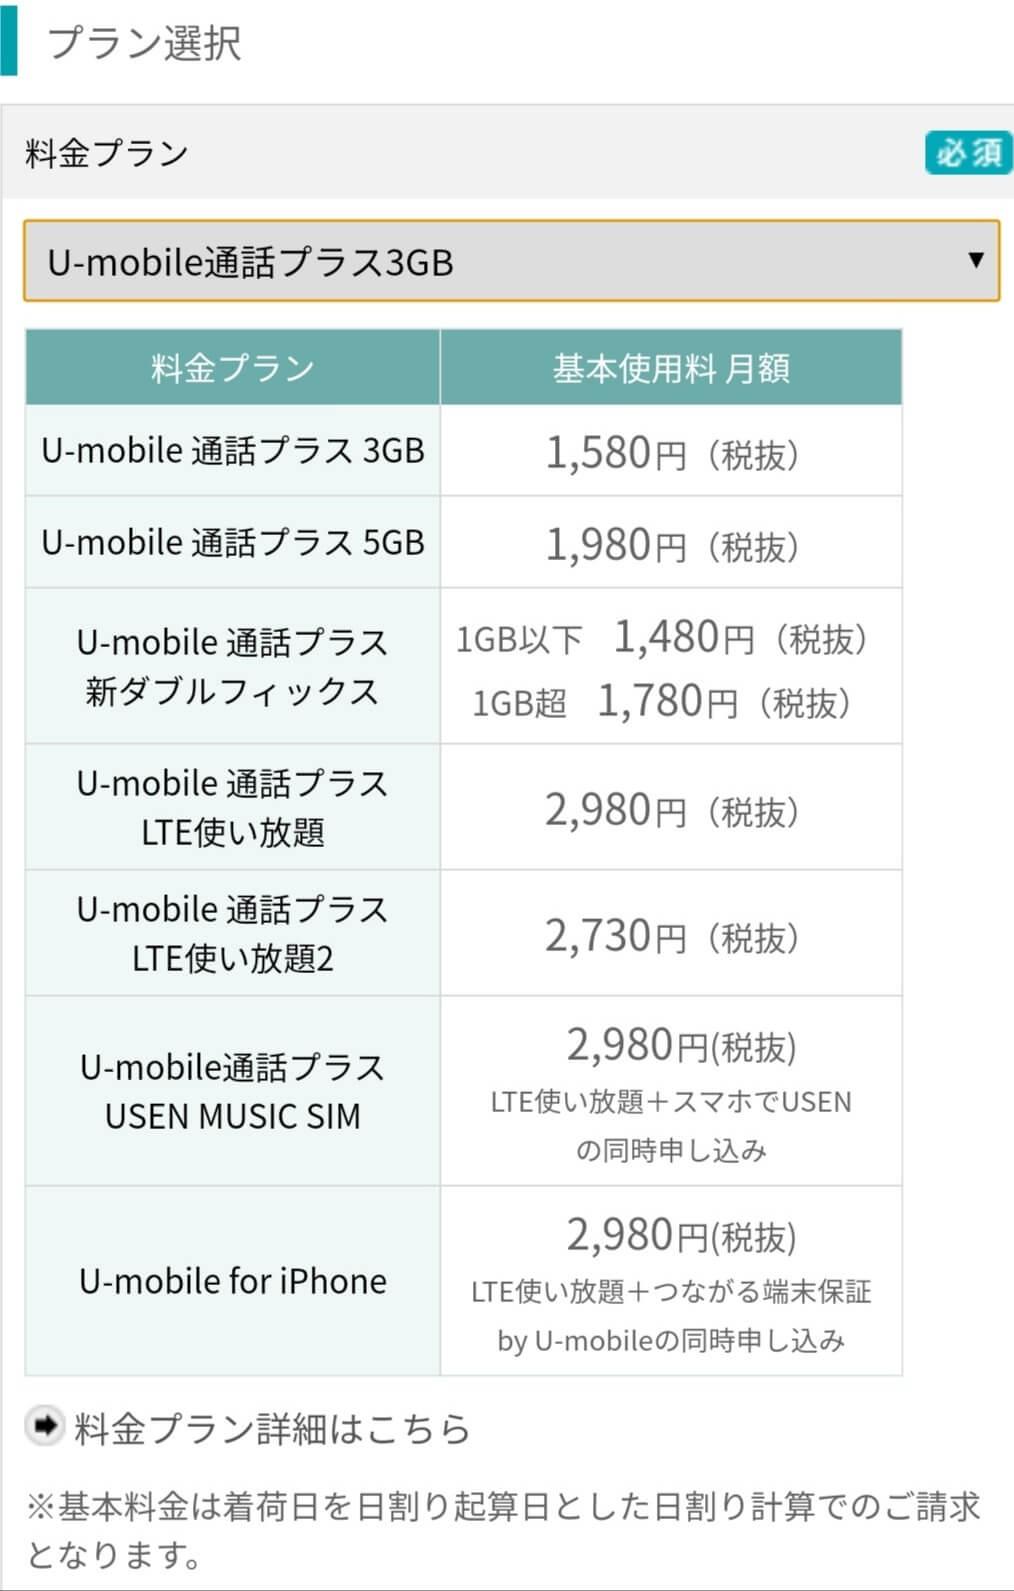 U-mobileのプランを選択